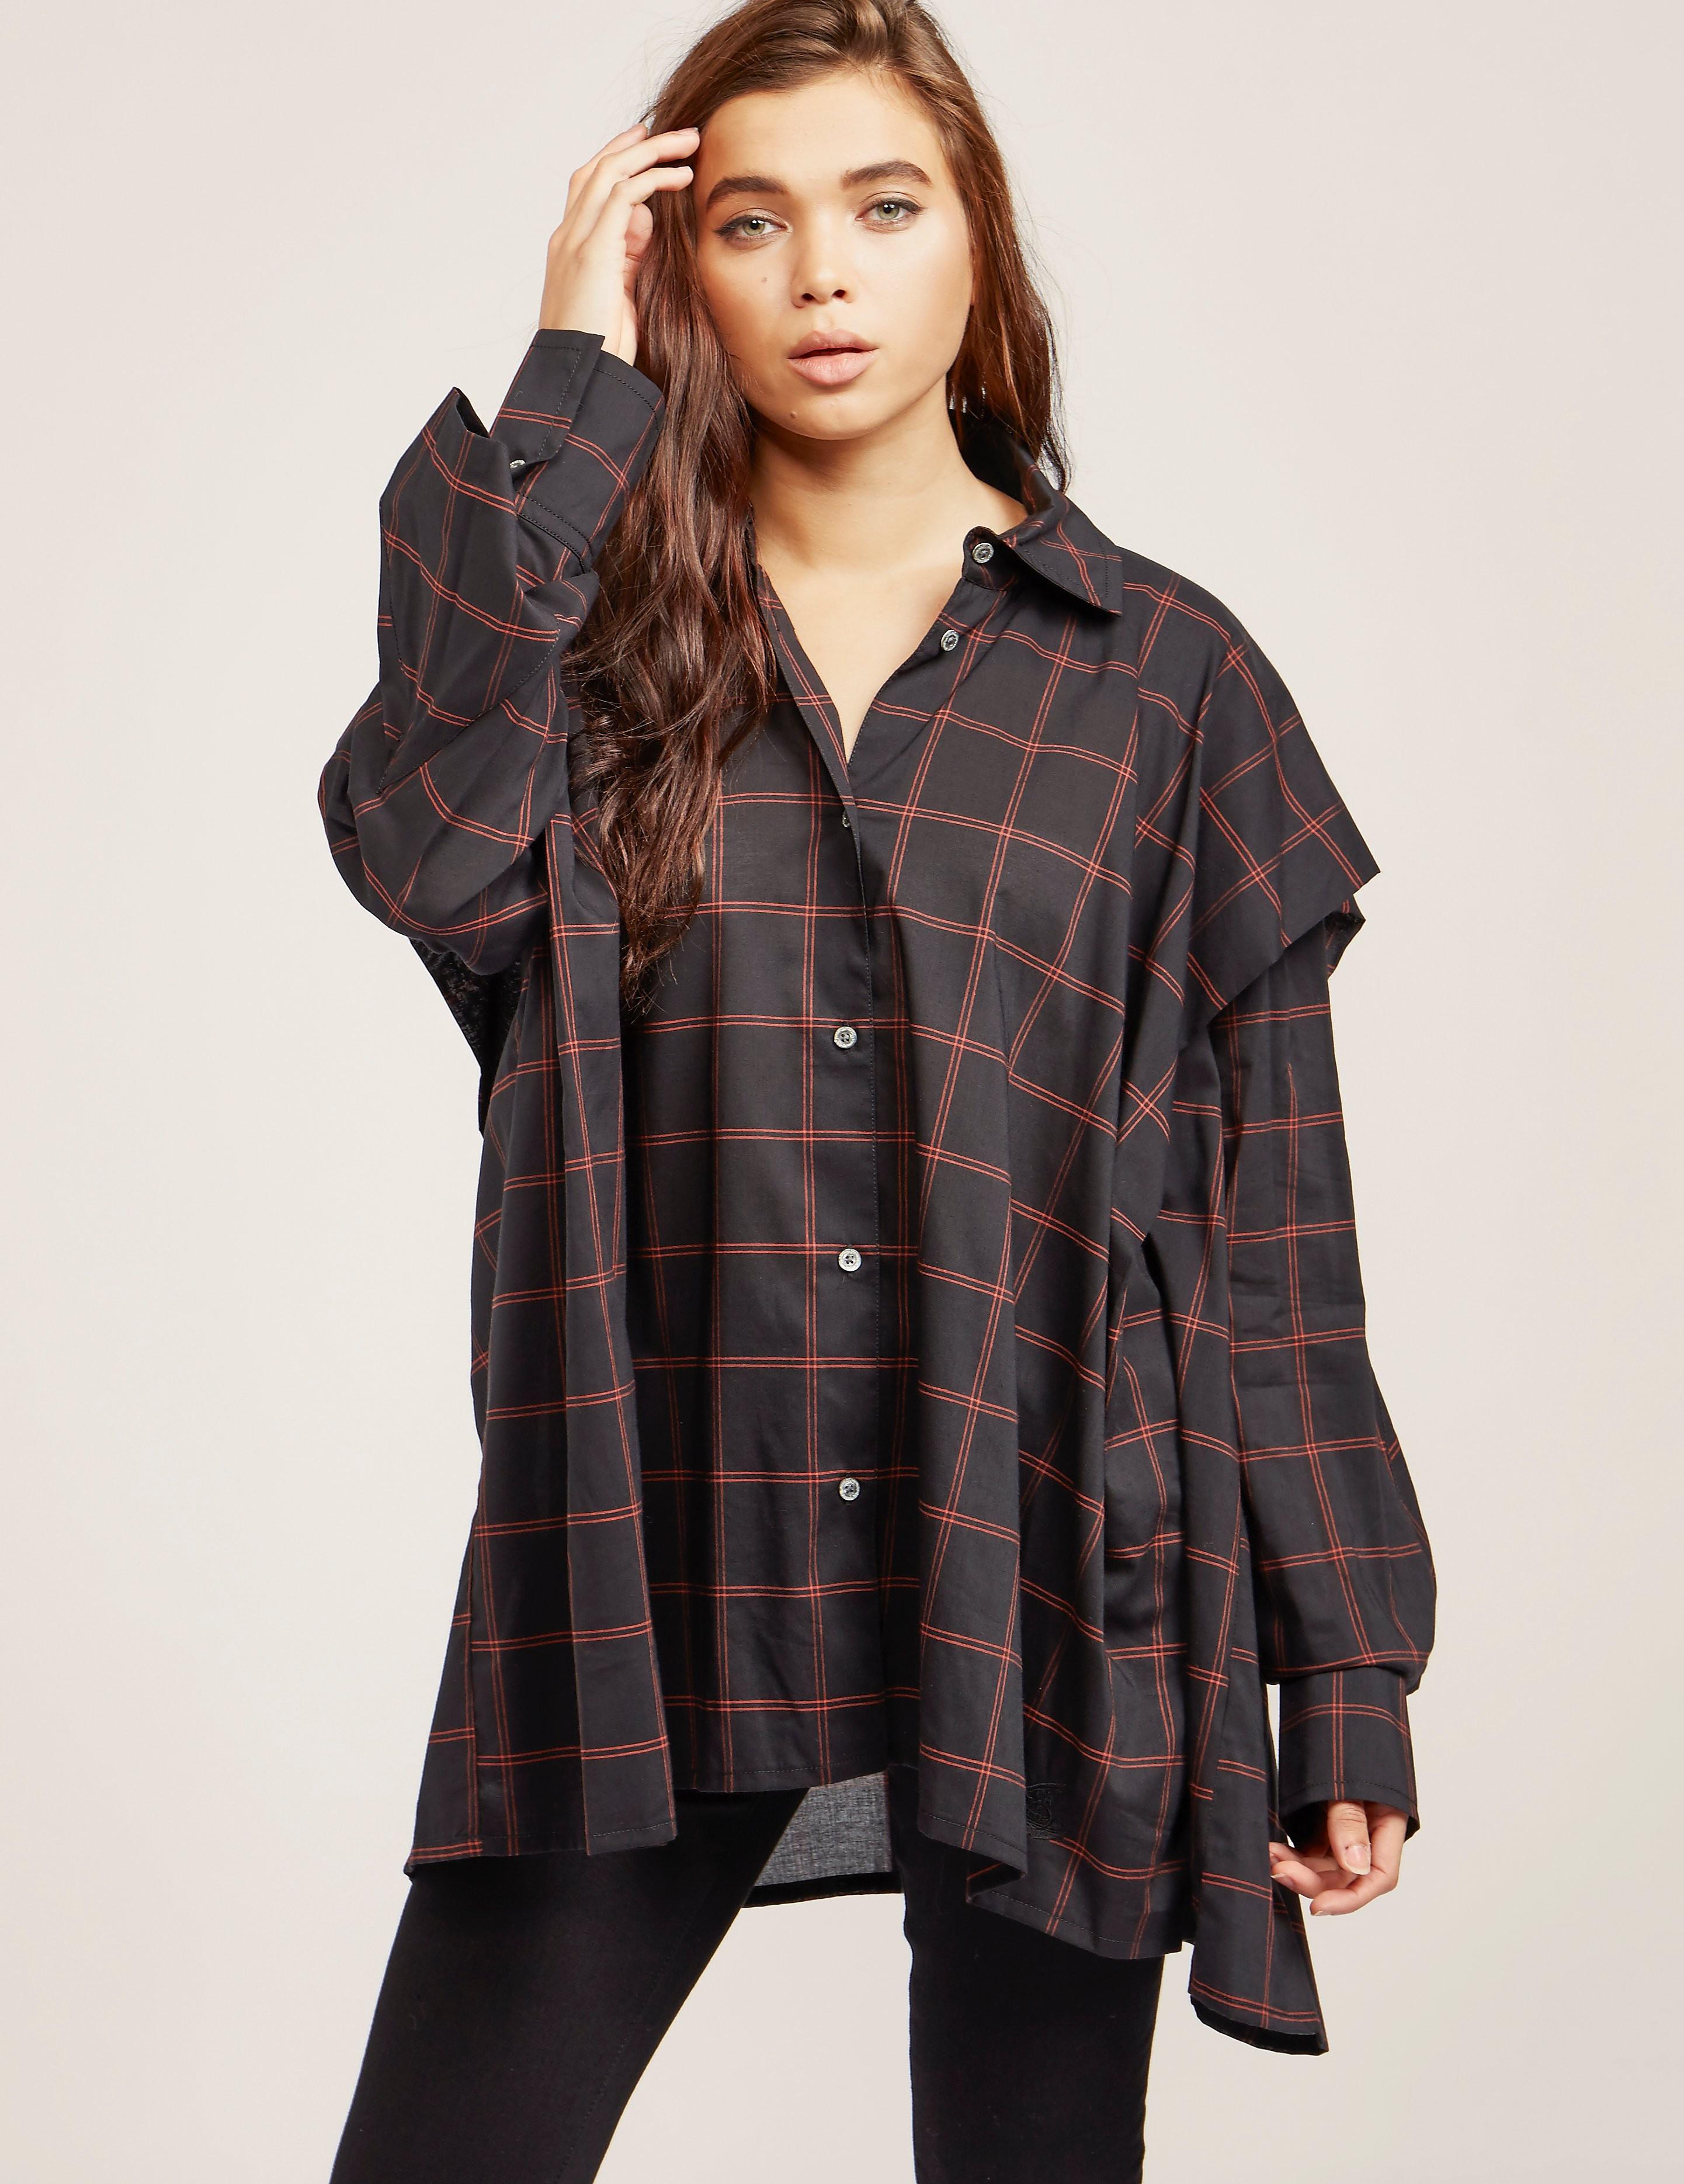 Vivienne Westwood Fever Long Sleeve Shirt